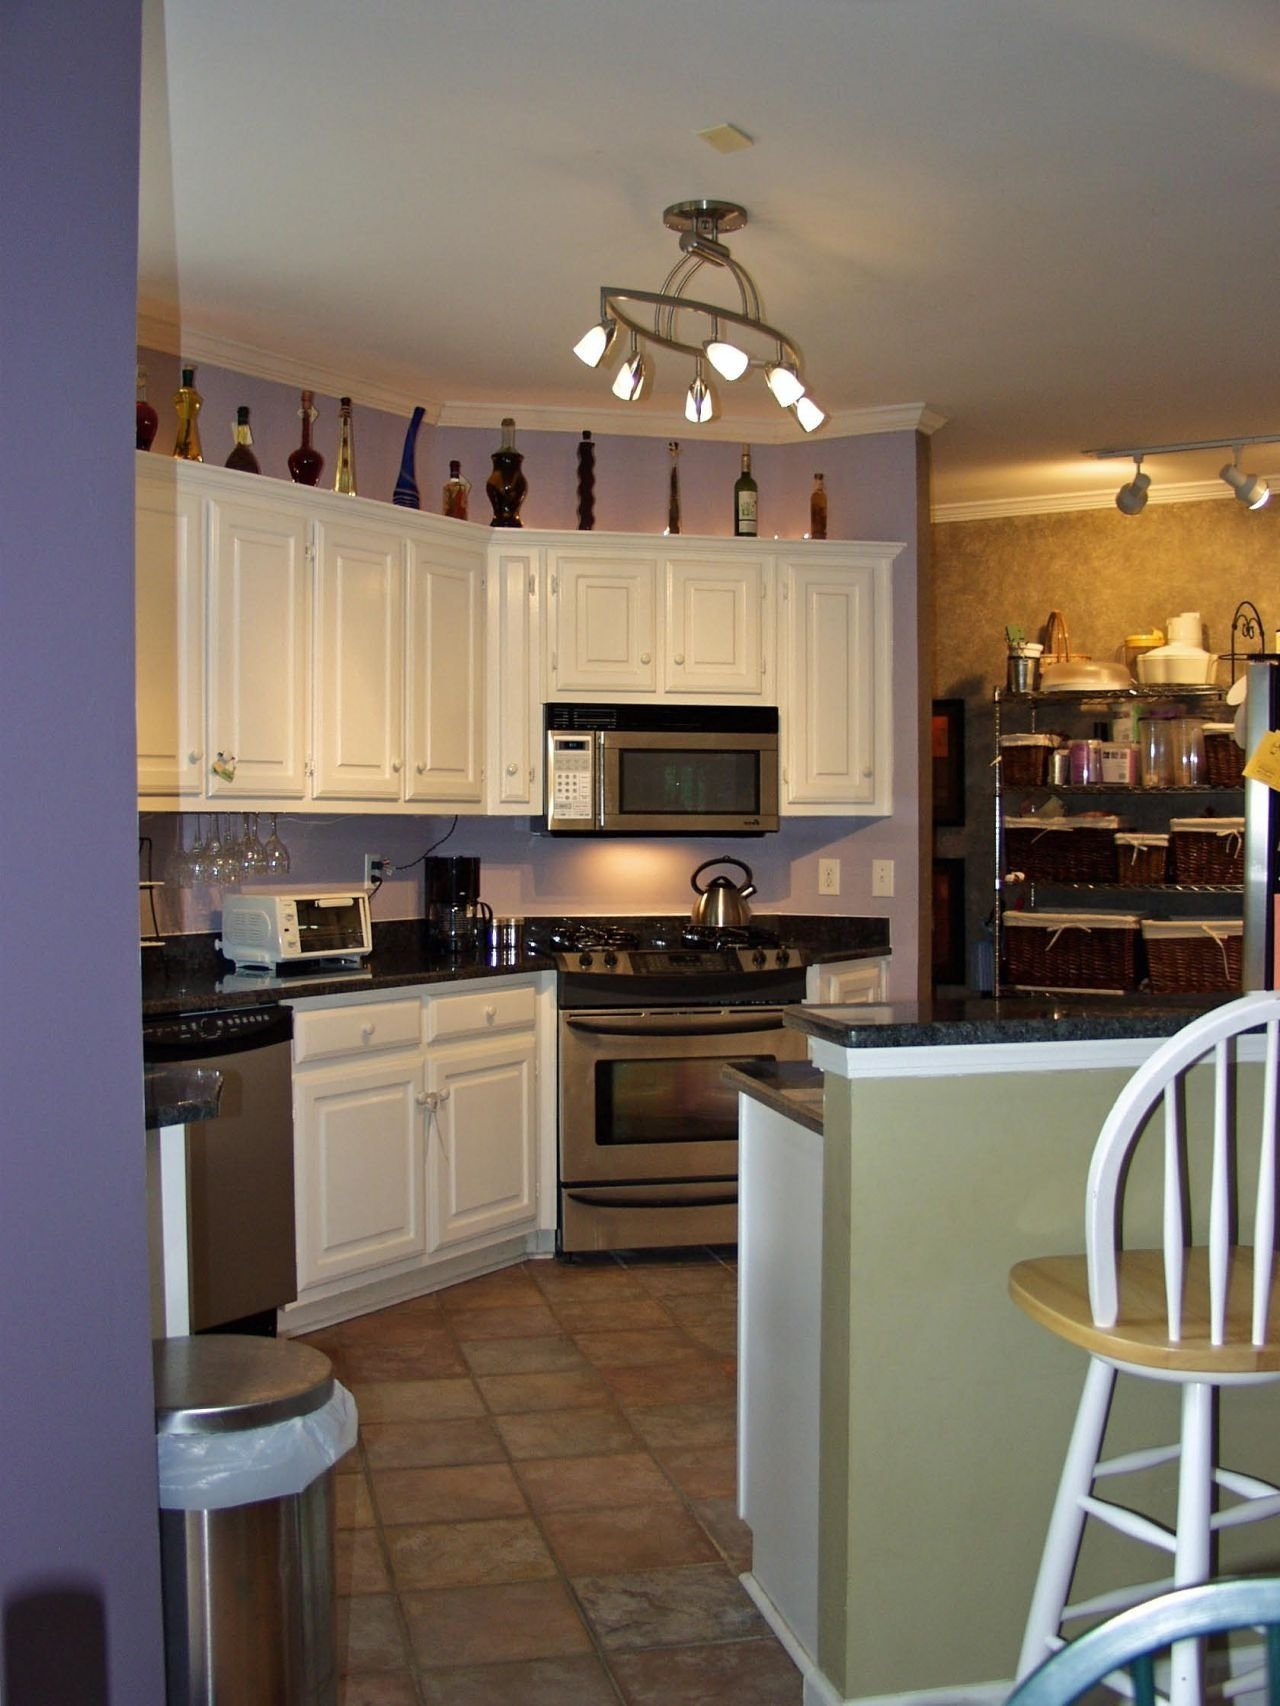 kitchen light fixtures for small kitchens - illuminating the kitchen